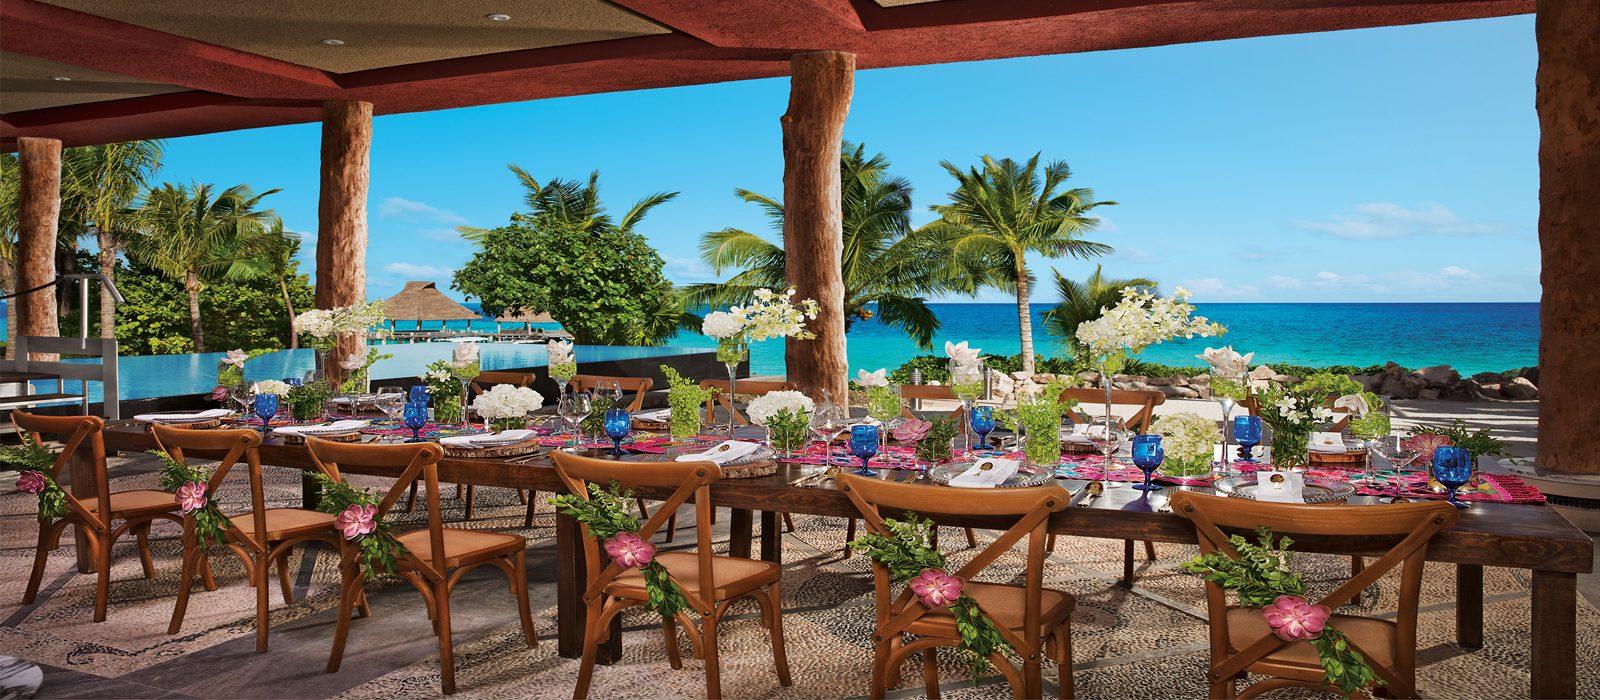 Beach Weddings Abroad Mexico Weddings Header